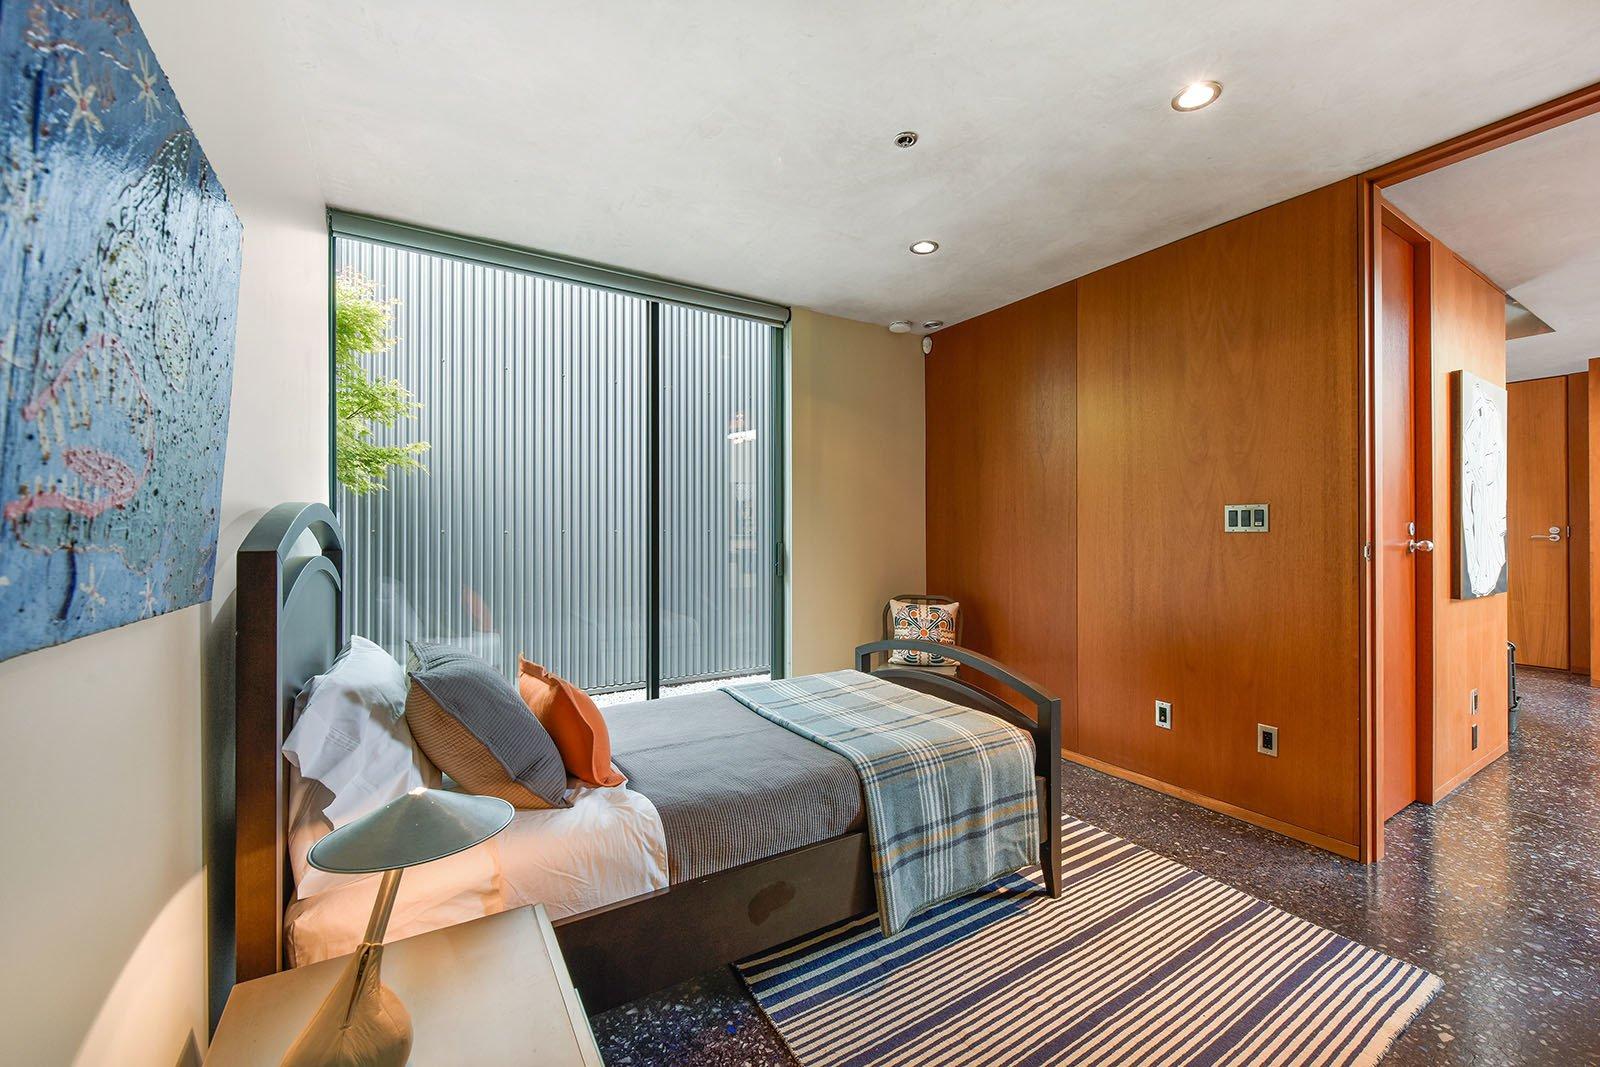 Bedroom, Concrete Floor, and Ceiling Lighting Level 1 teen bedroom  The Rempel Temple